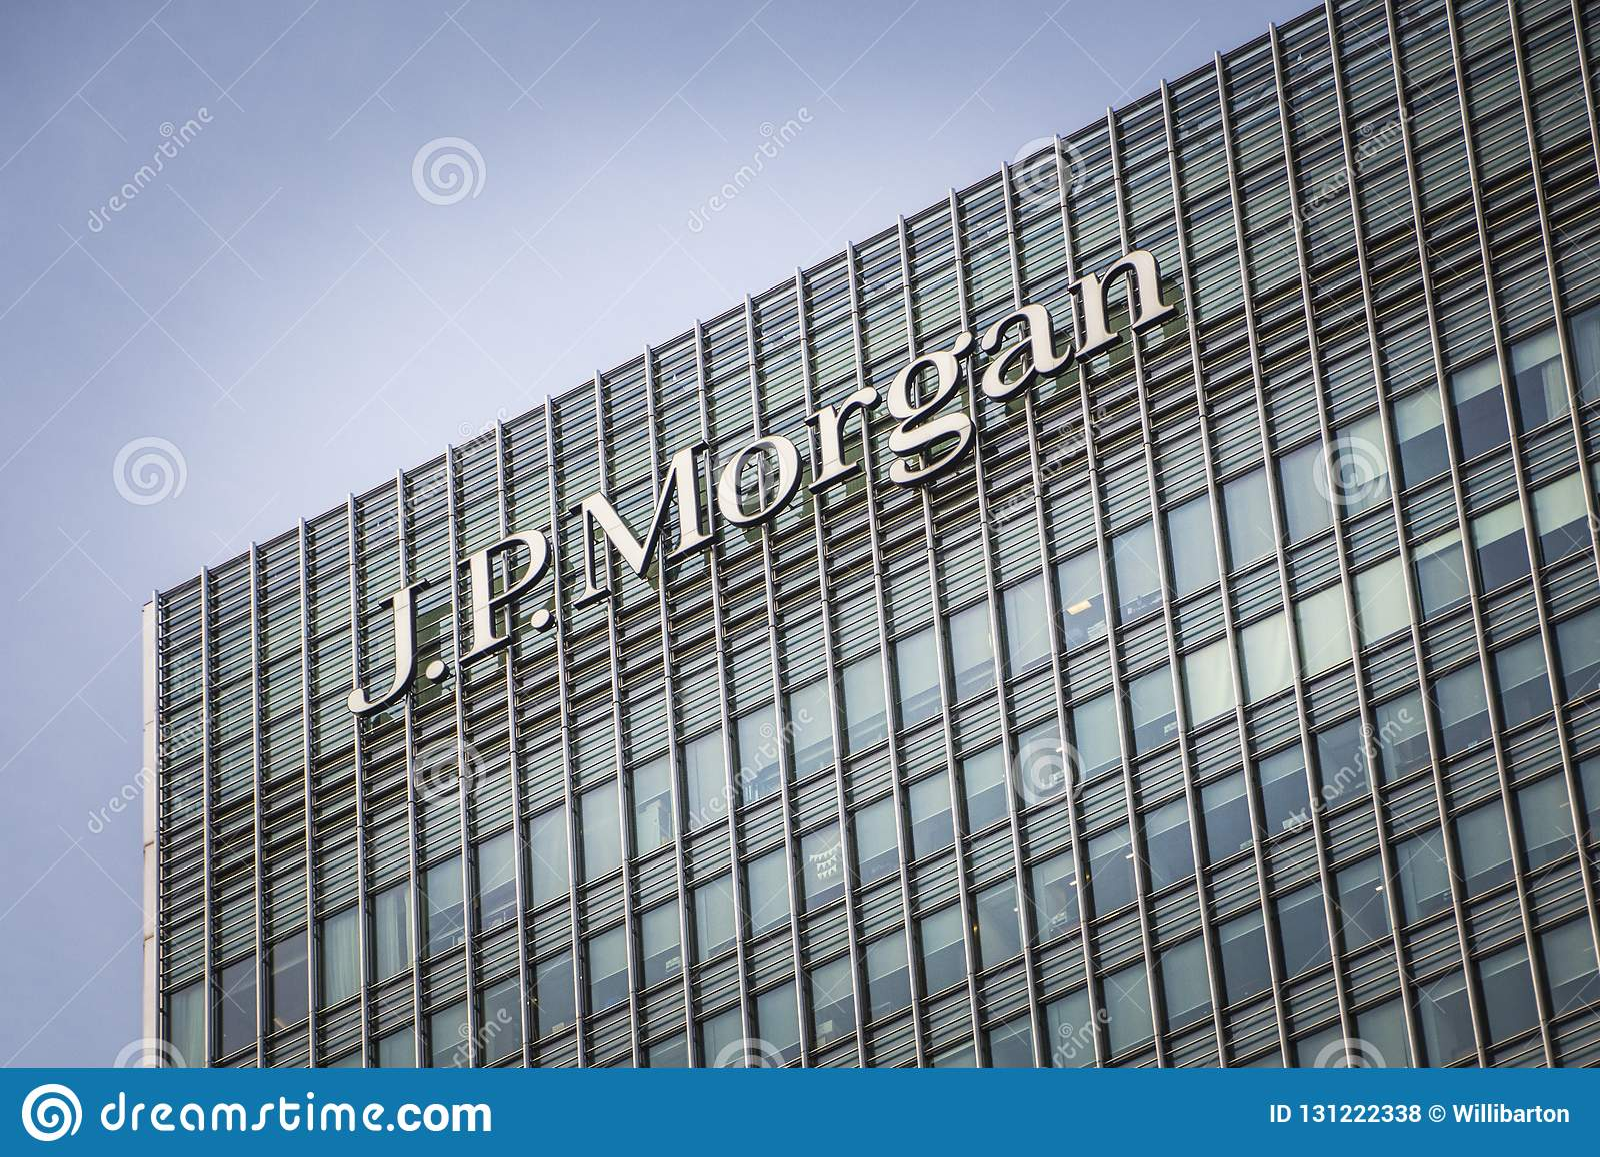 JP Morgan building, Canary Wharf